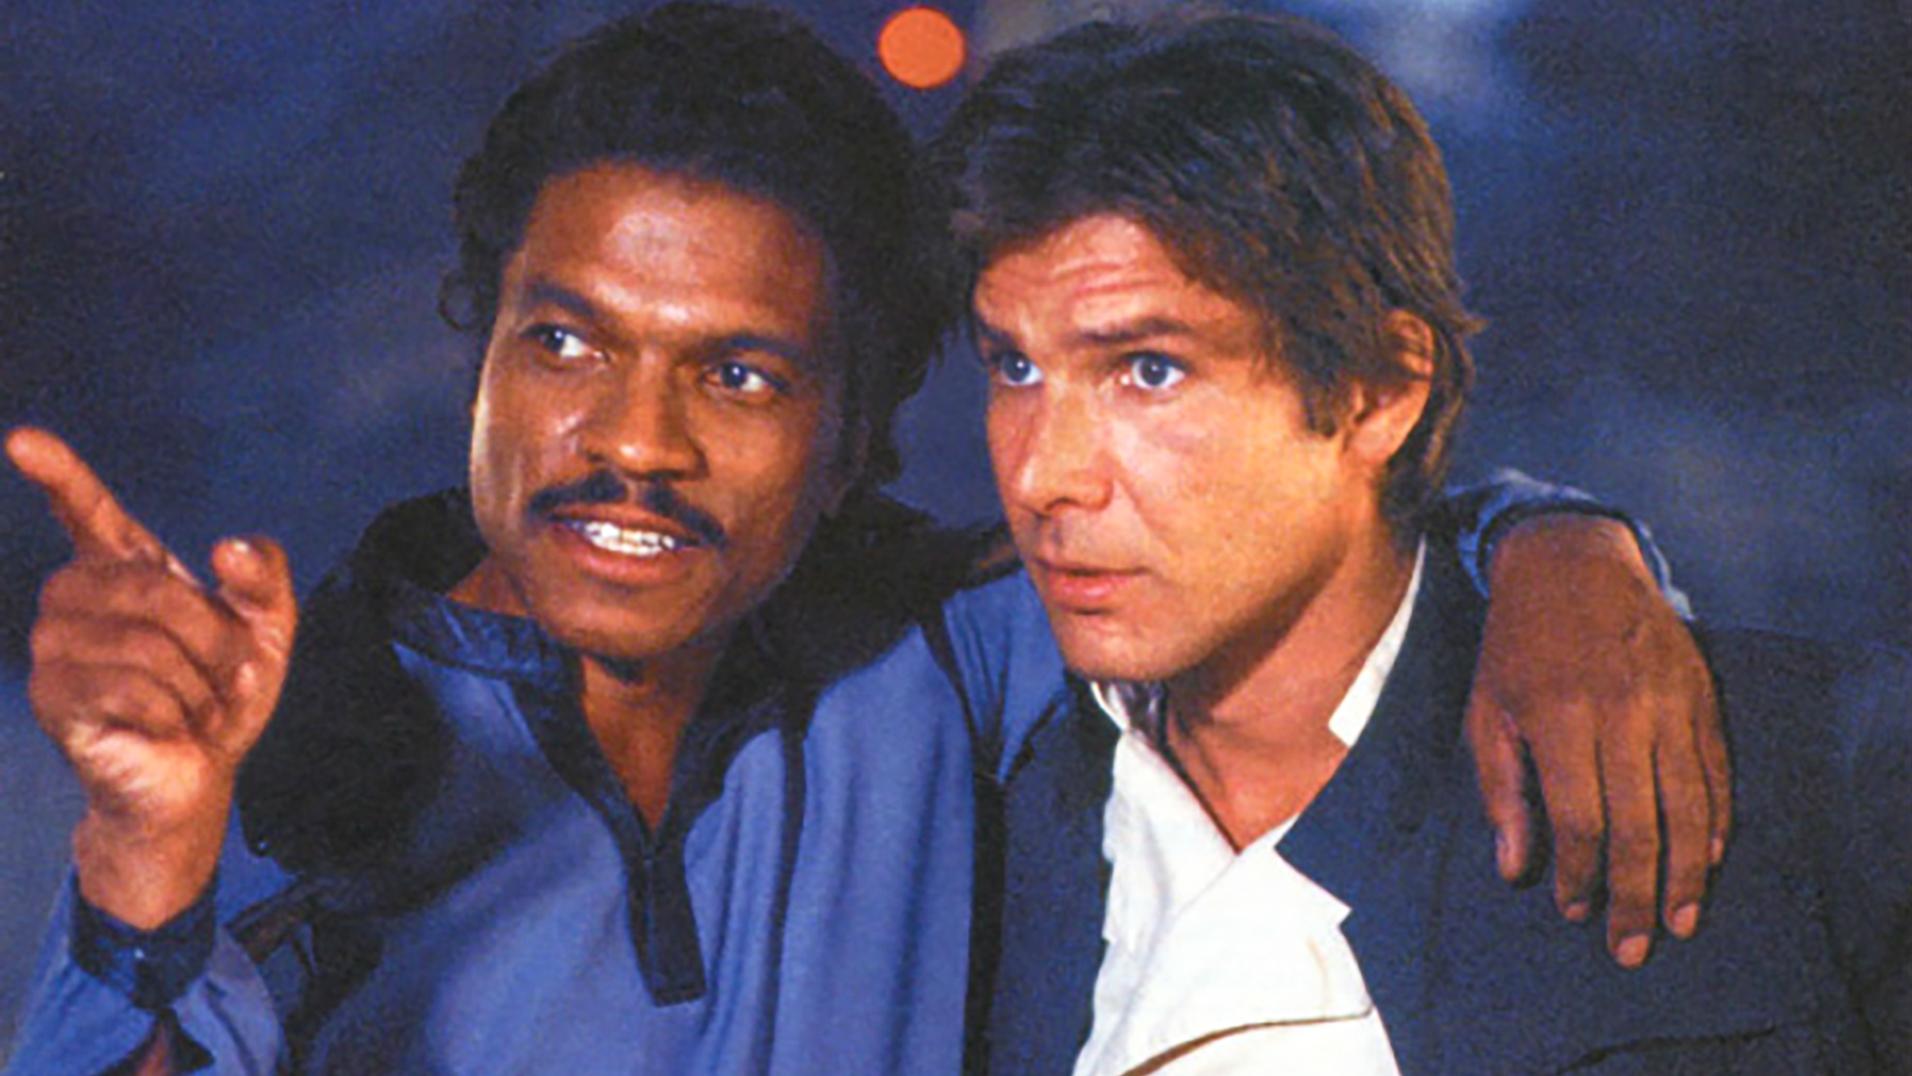 Original Lando, Billy Dee Williams, returning to Star Wars: Episode IX screenshot